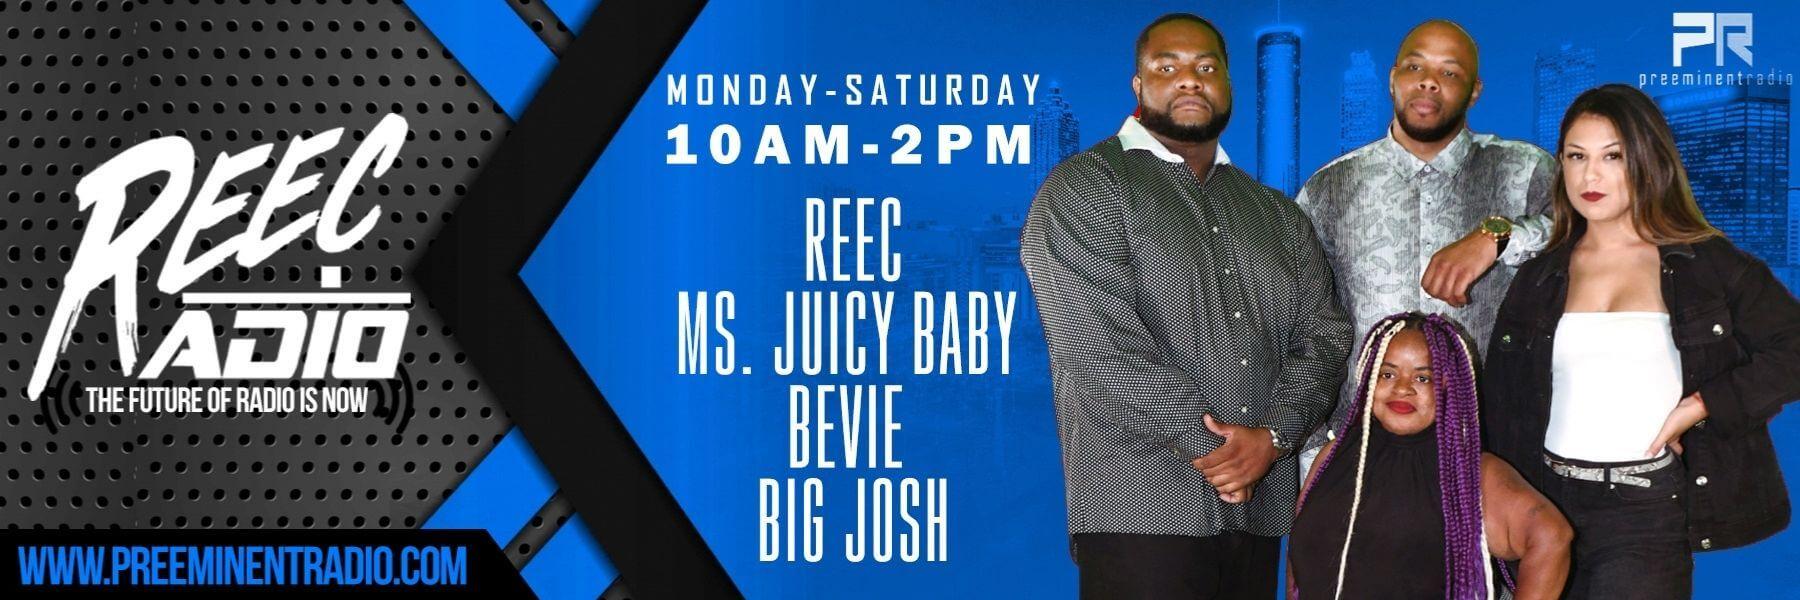 Reec Radio